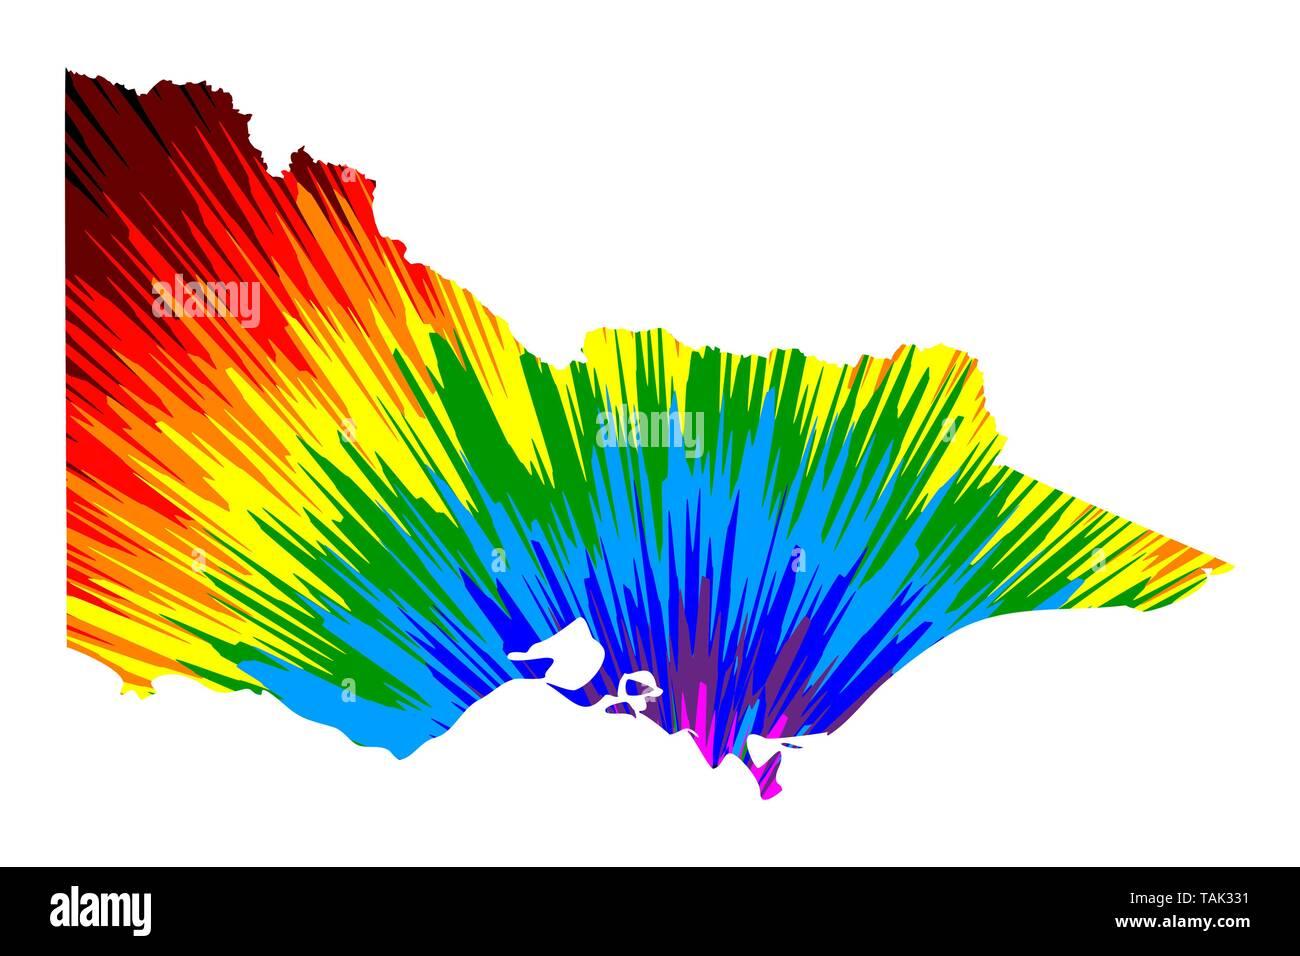 Australia Map States And Territories.Victoria Australian States And Territories Vic Map Is Designed